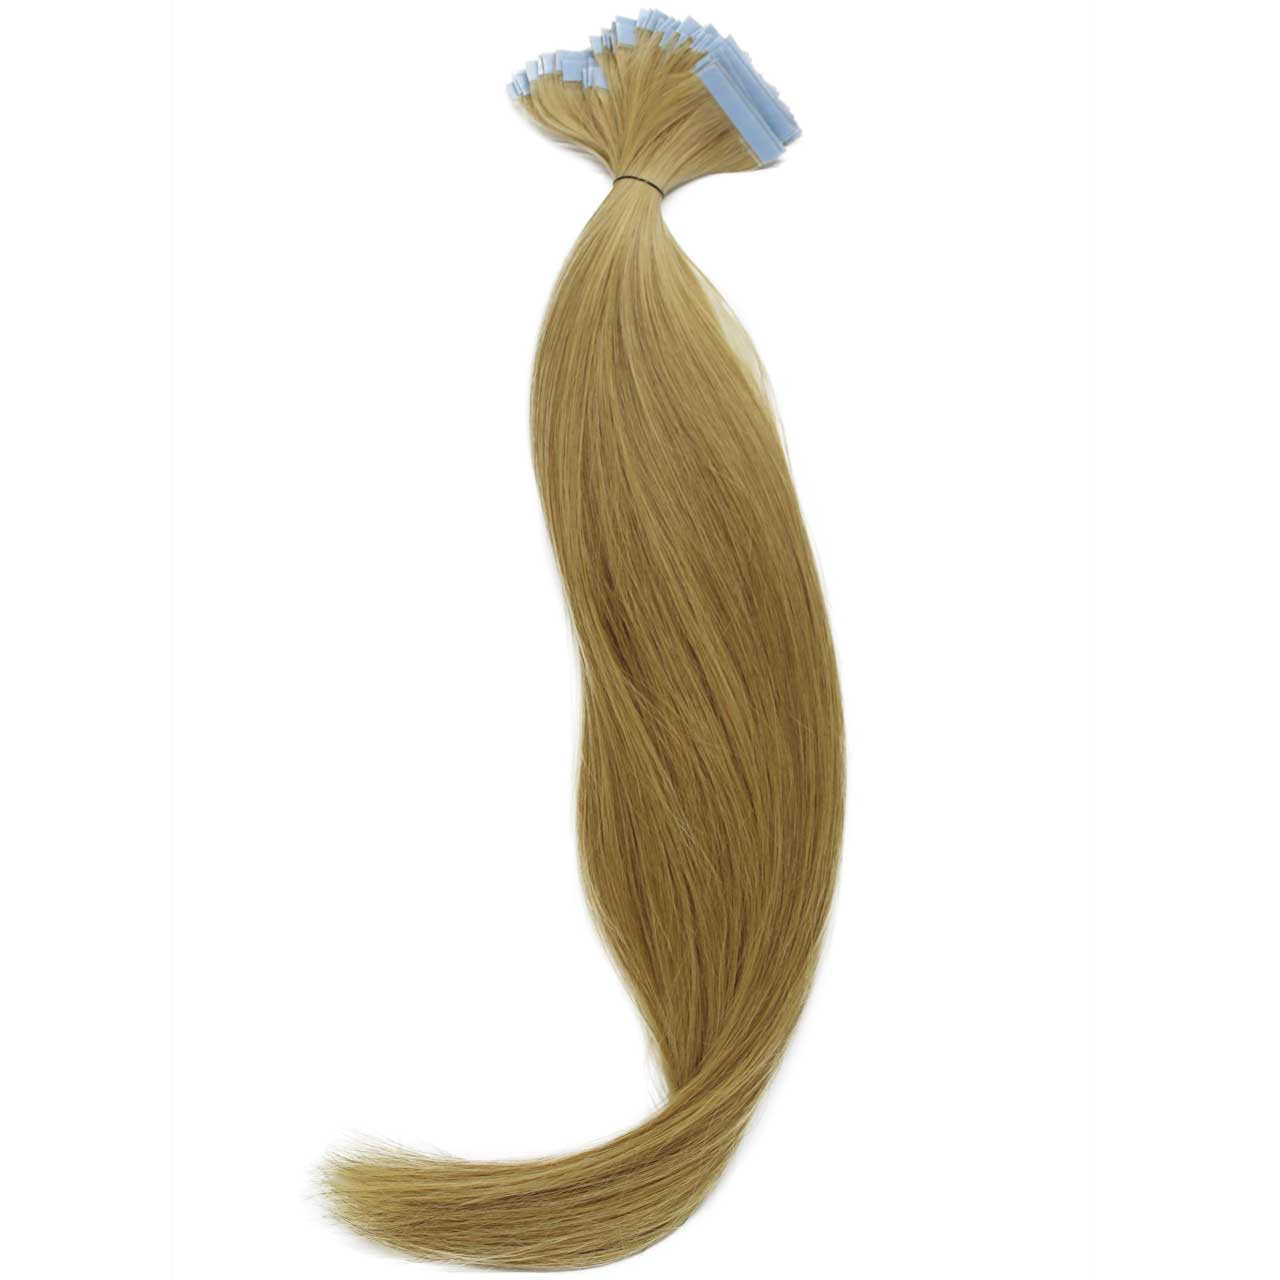 Mega Hair de Fita Adesiva Nano - Micro Pele Loiro Claro 120g Cabelo Humano Liso